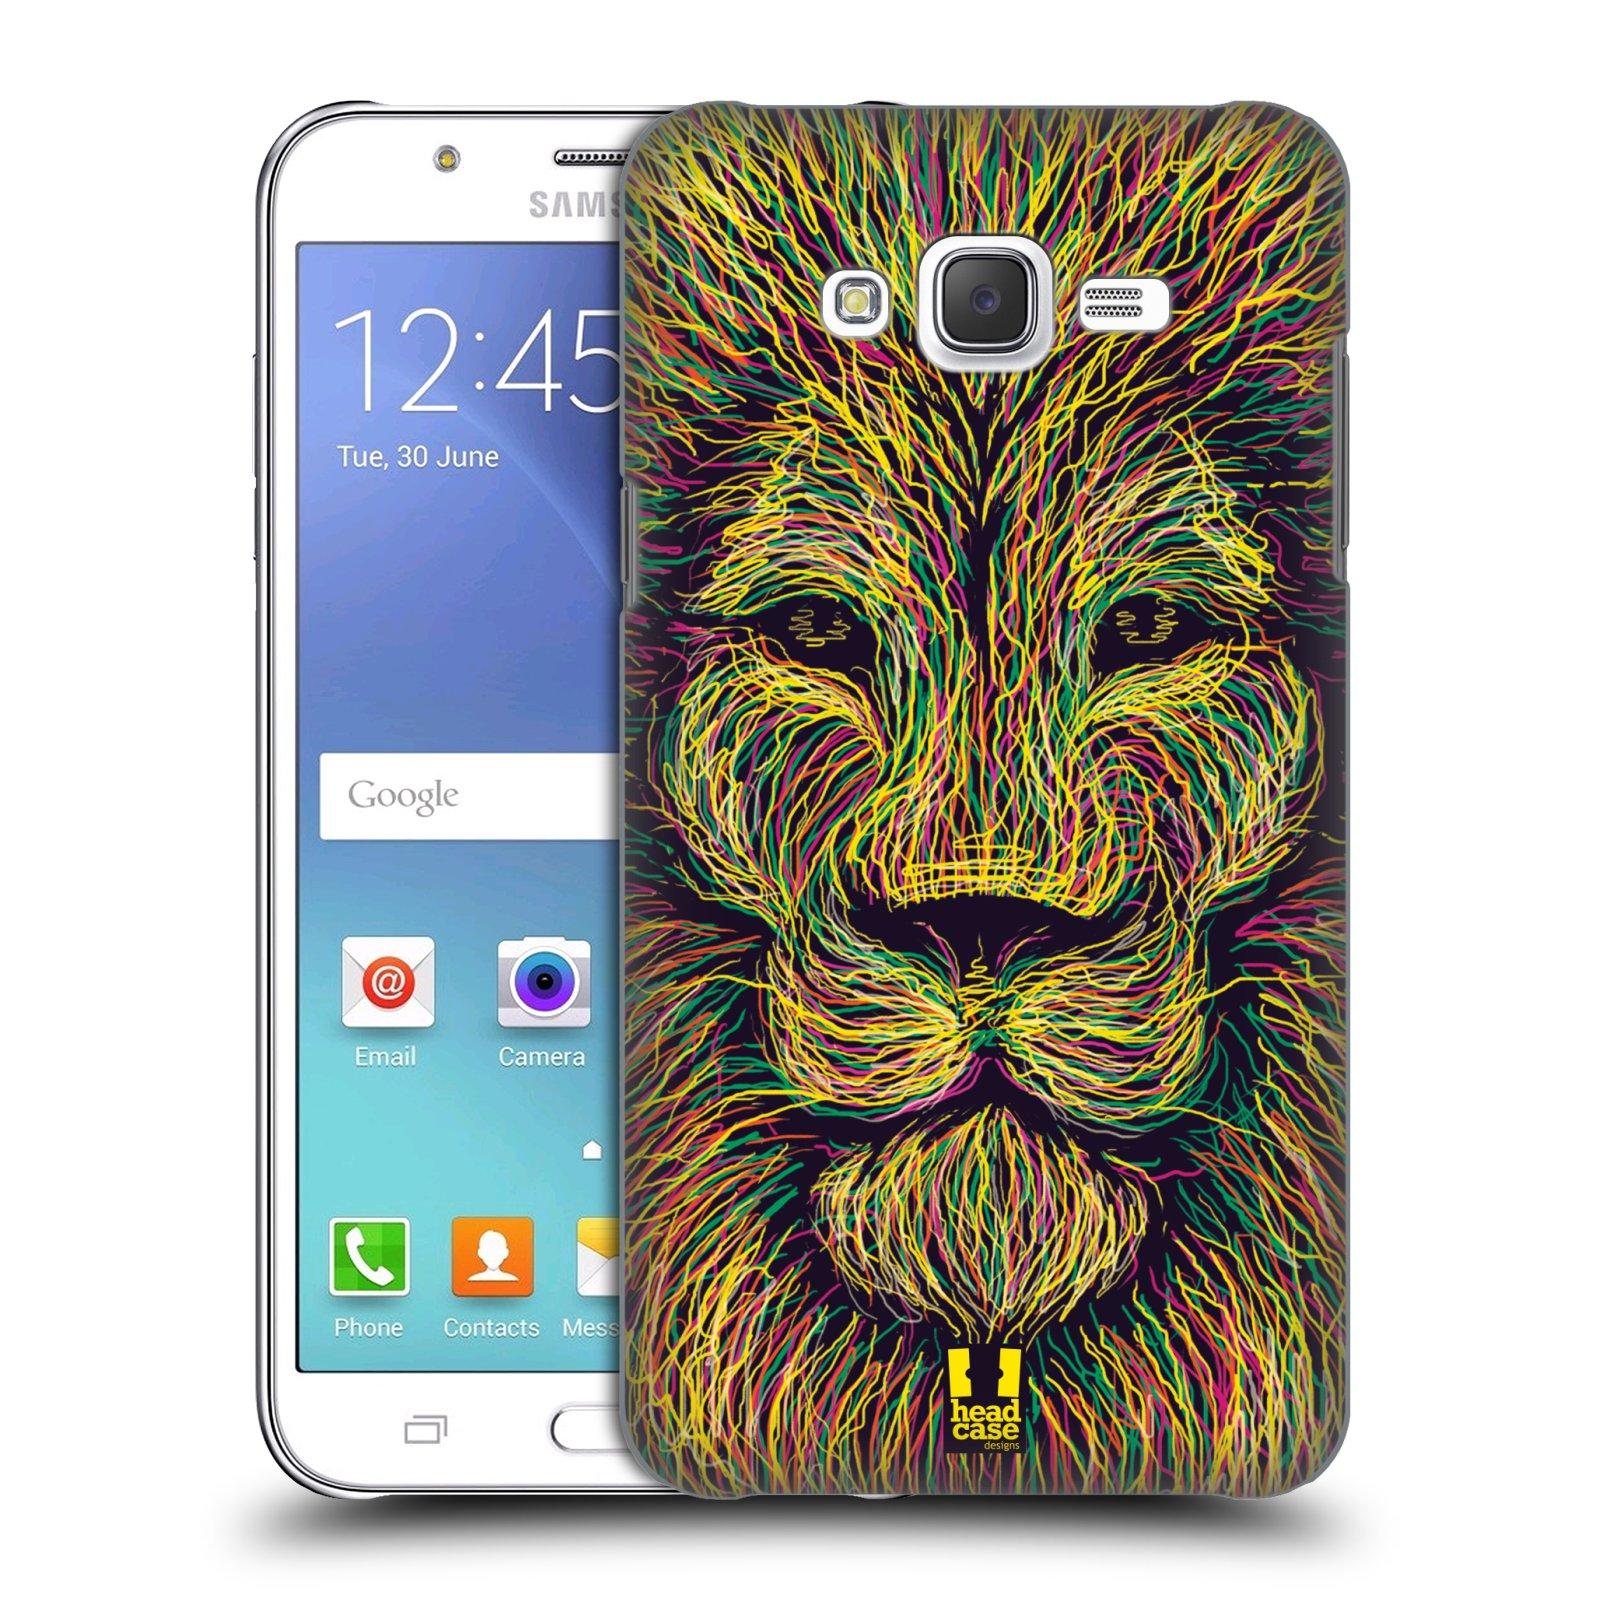 HEAD CASE plastový obal na mobil SAMSUNG Galaxy J7, J700 vzor zvíře čmáranice lev